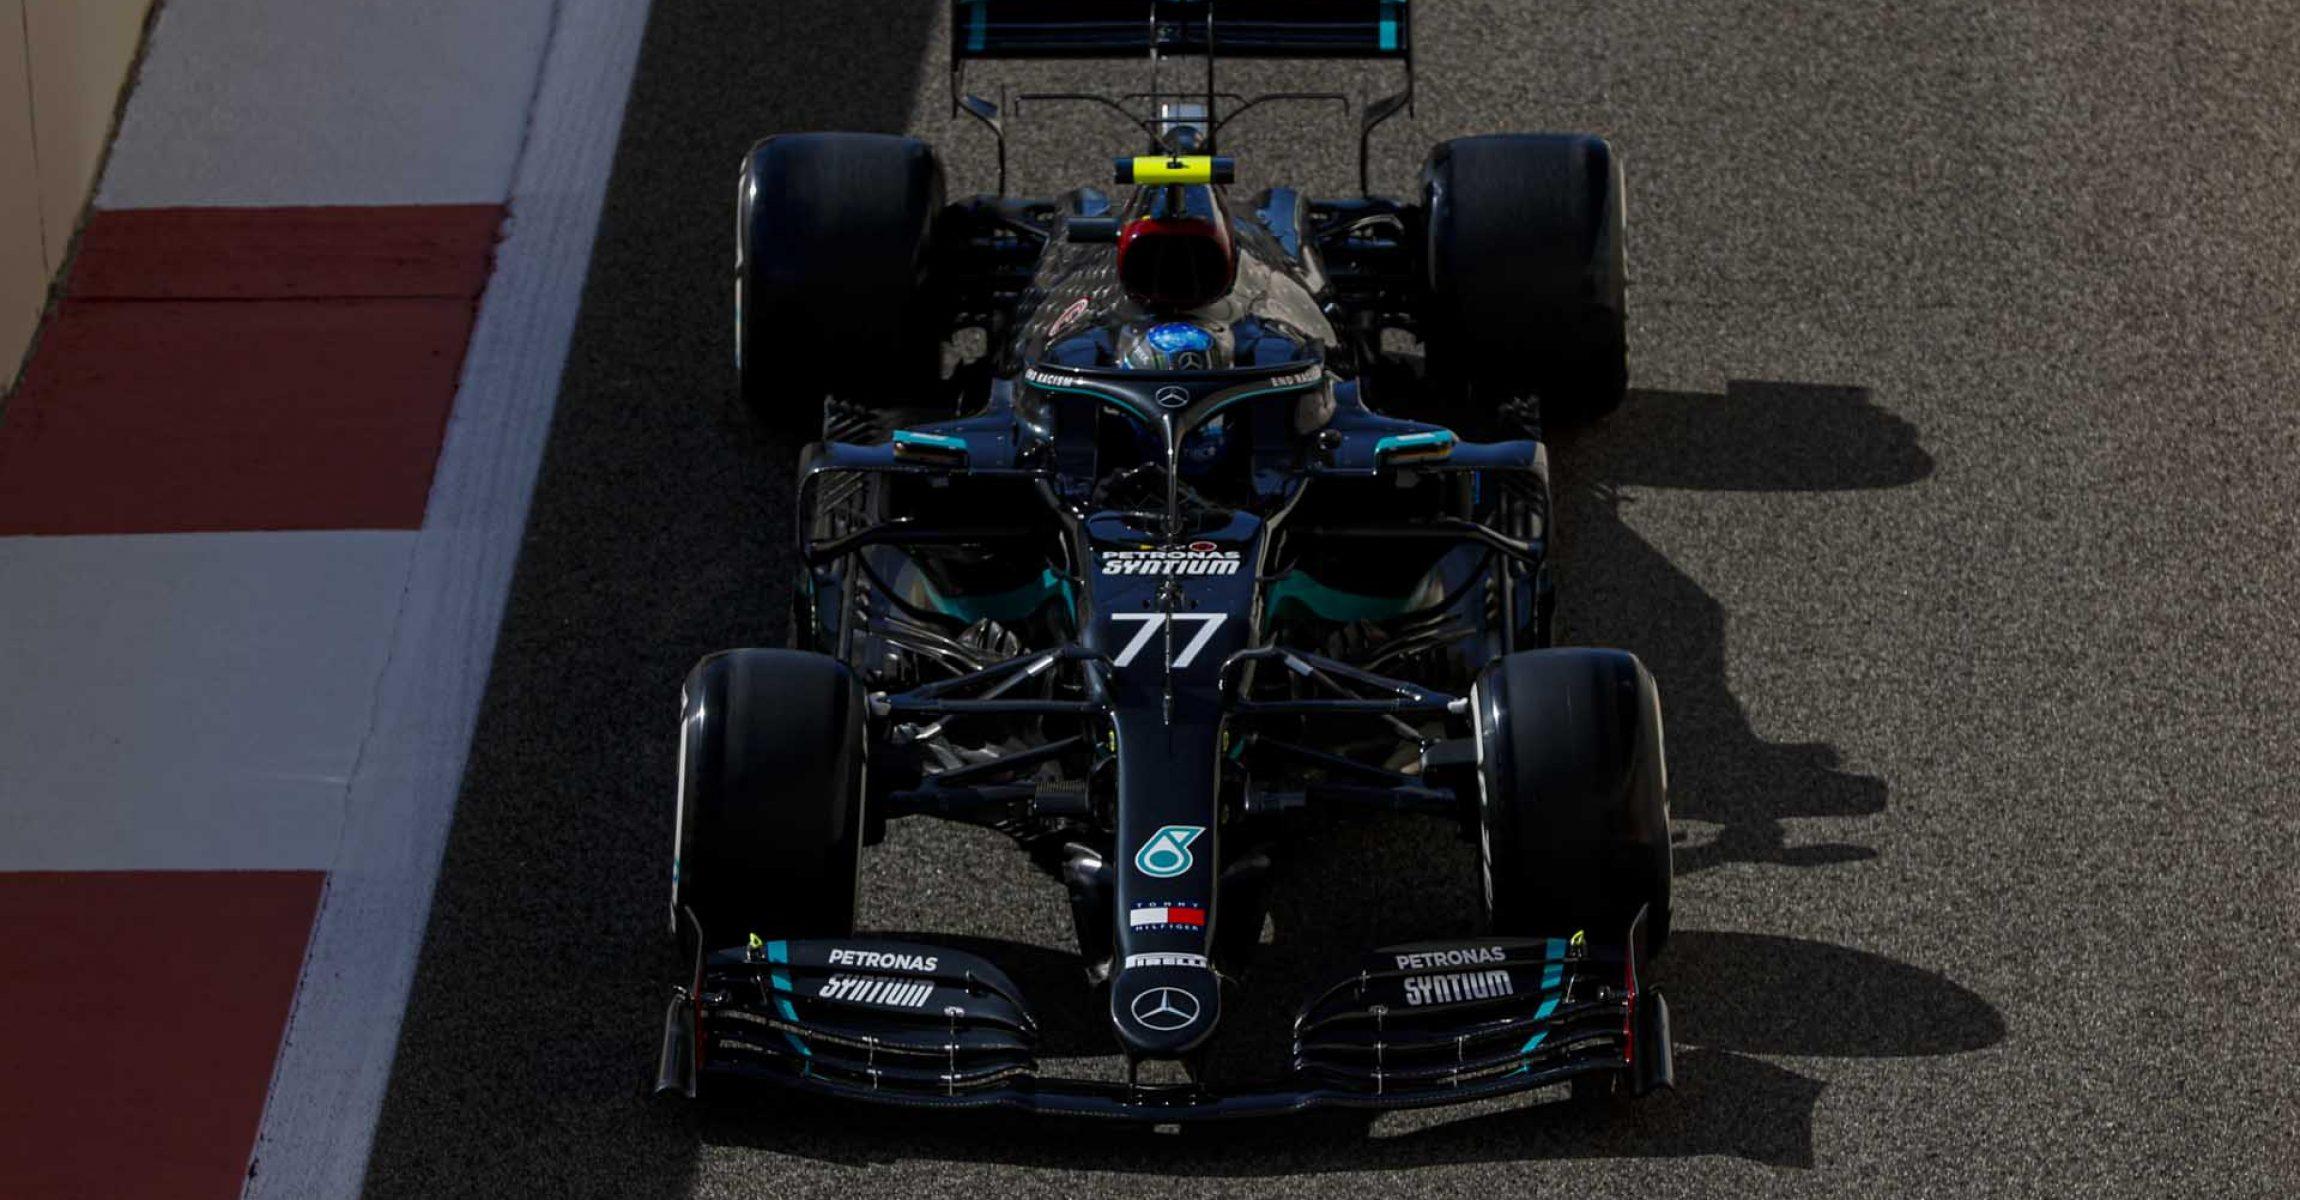 2020 Abu Dhabi Grand Prix, Friday - LAT Images Valtteri Bottas Mercedes